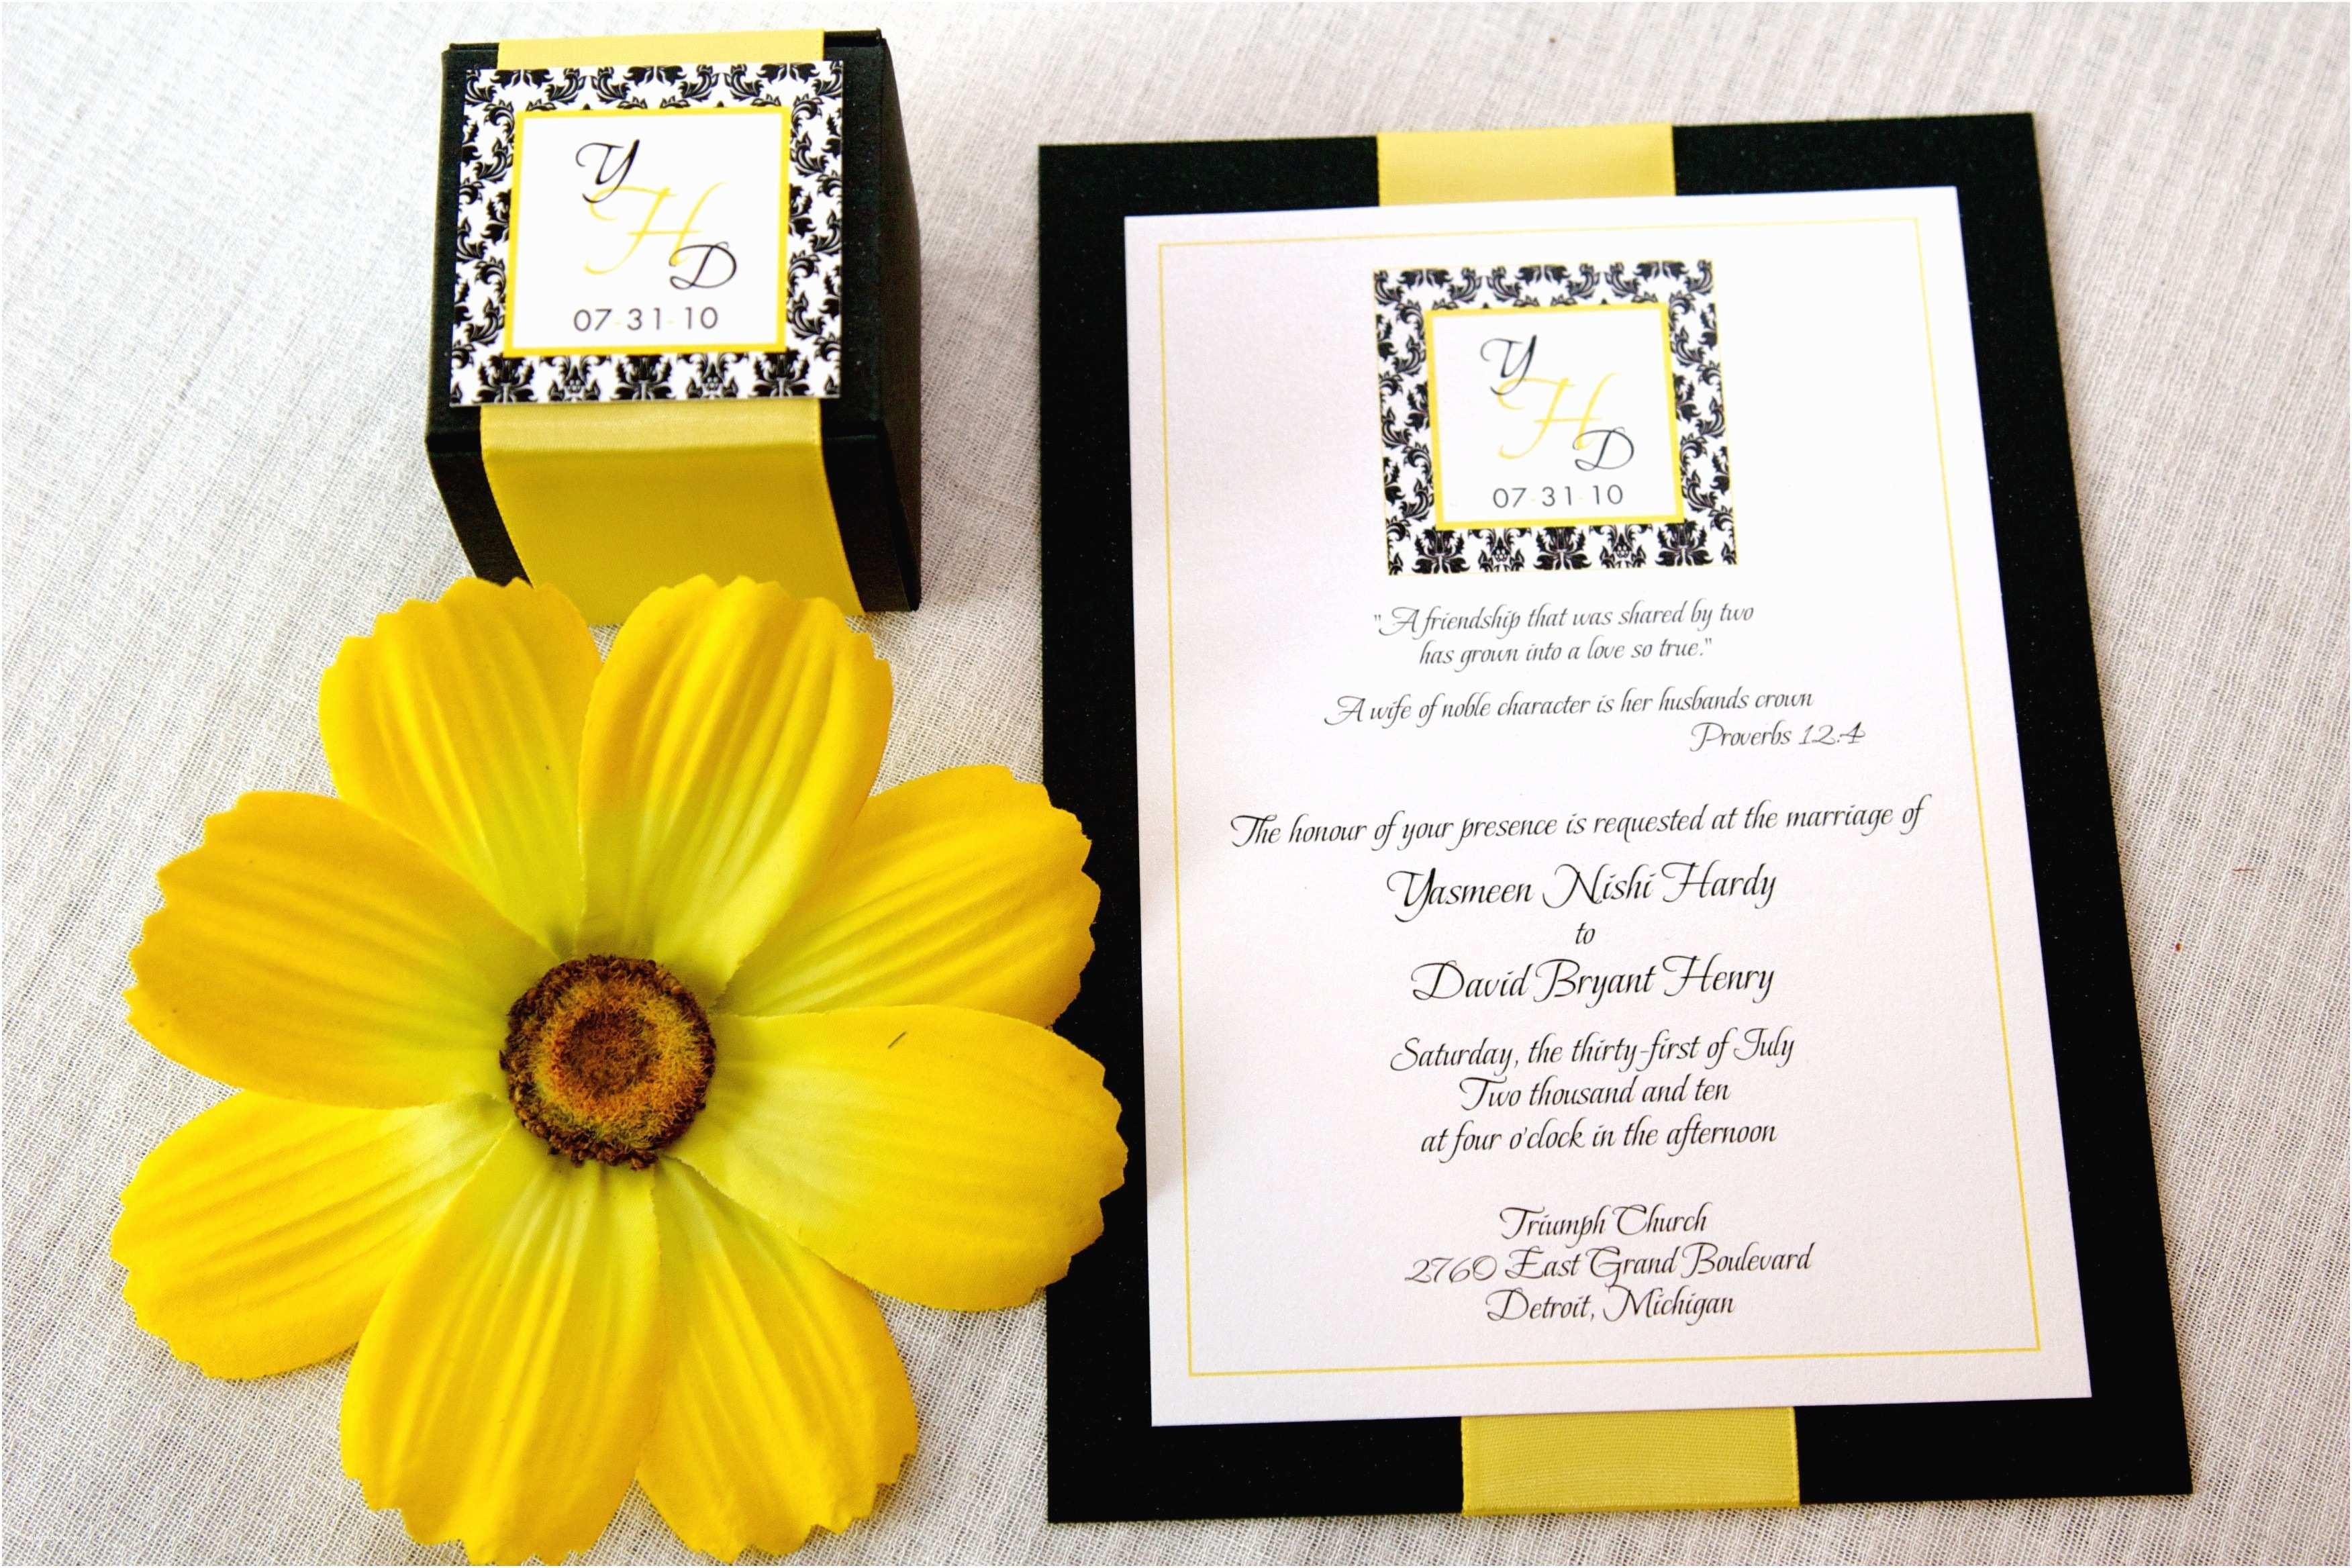 Design Wedding Invitations Online Design Your Own Wedding Invitations Line